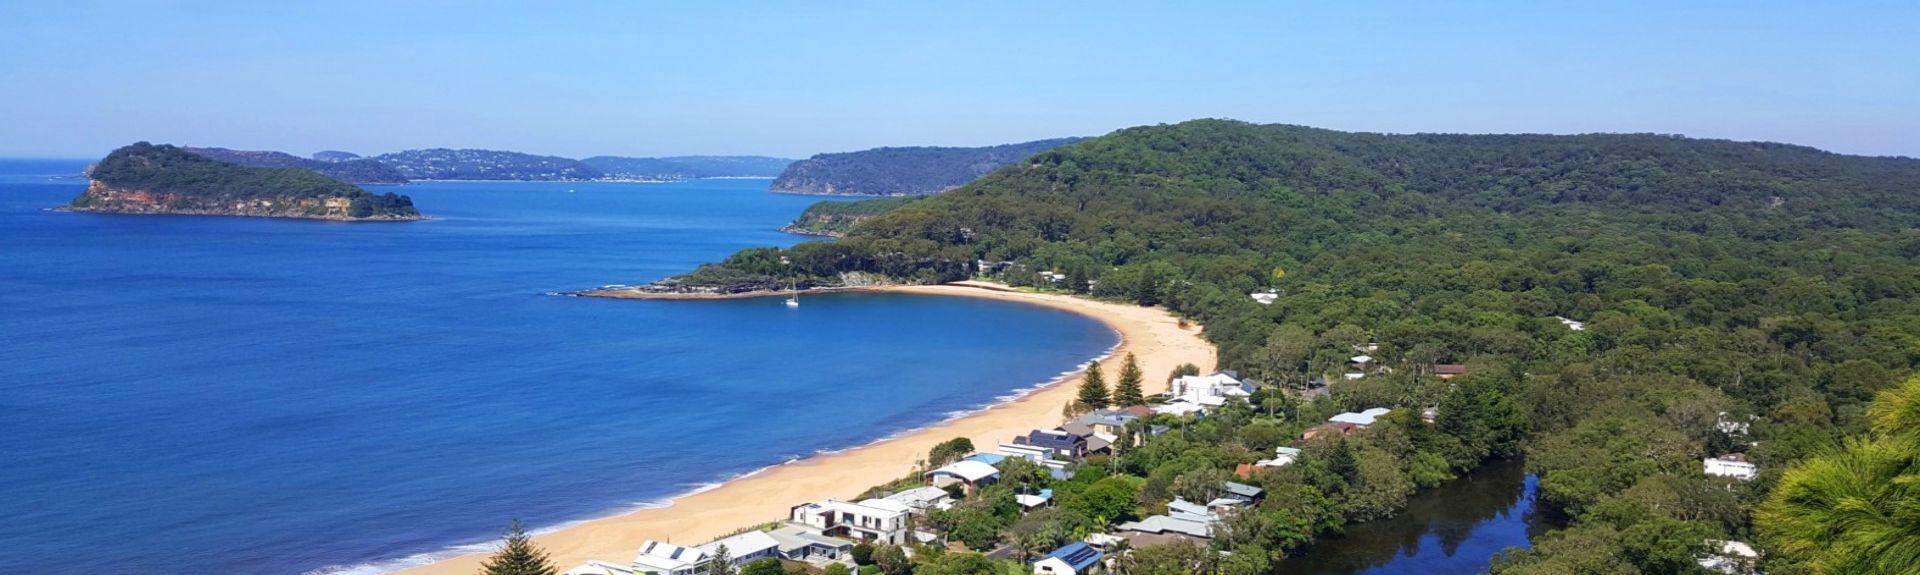 Horsfield Bay, NSW, Australia